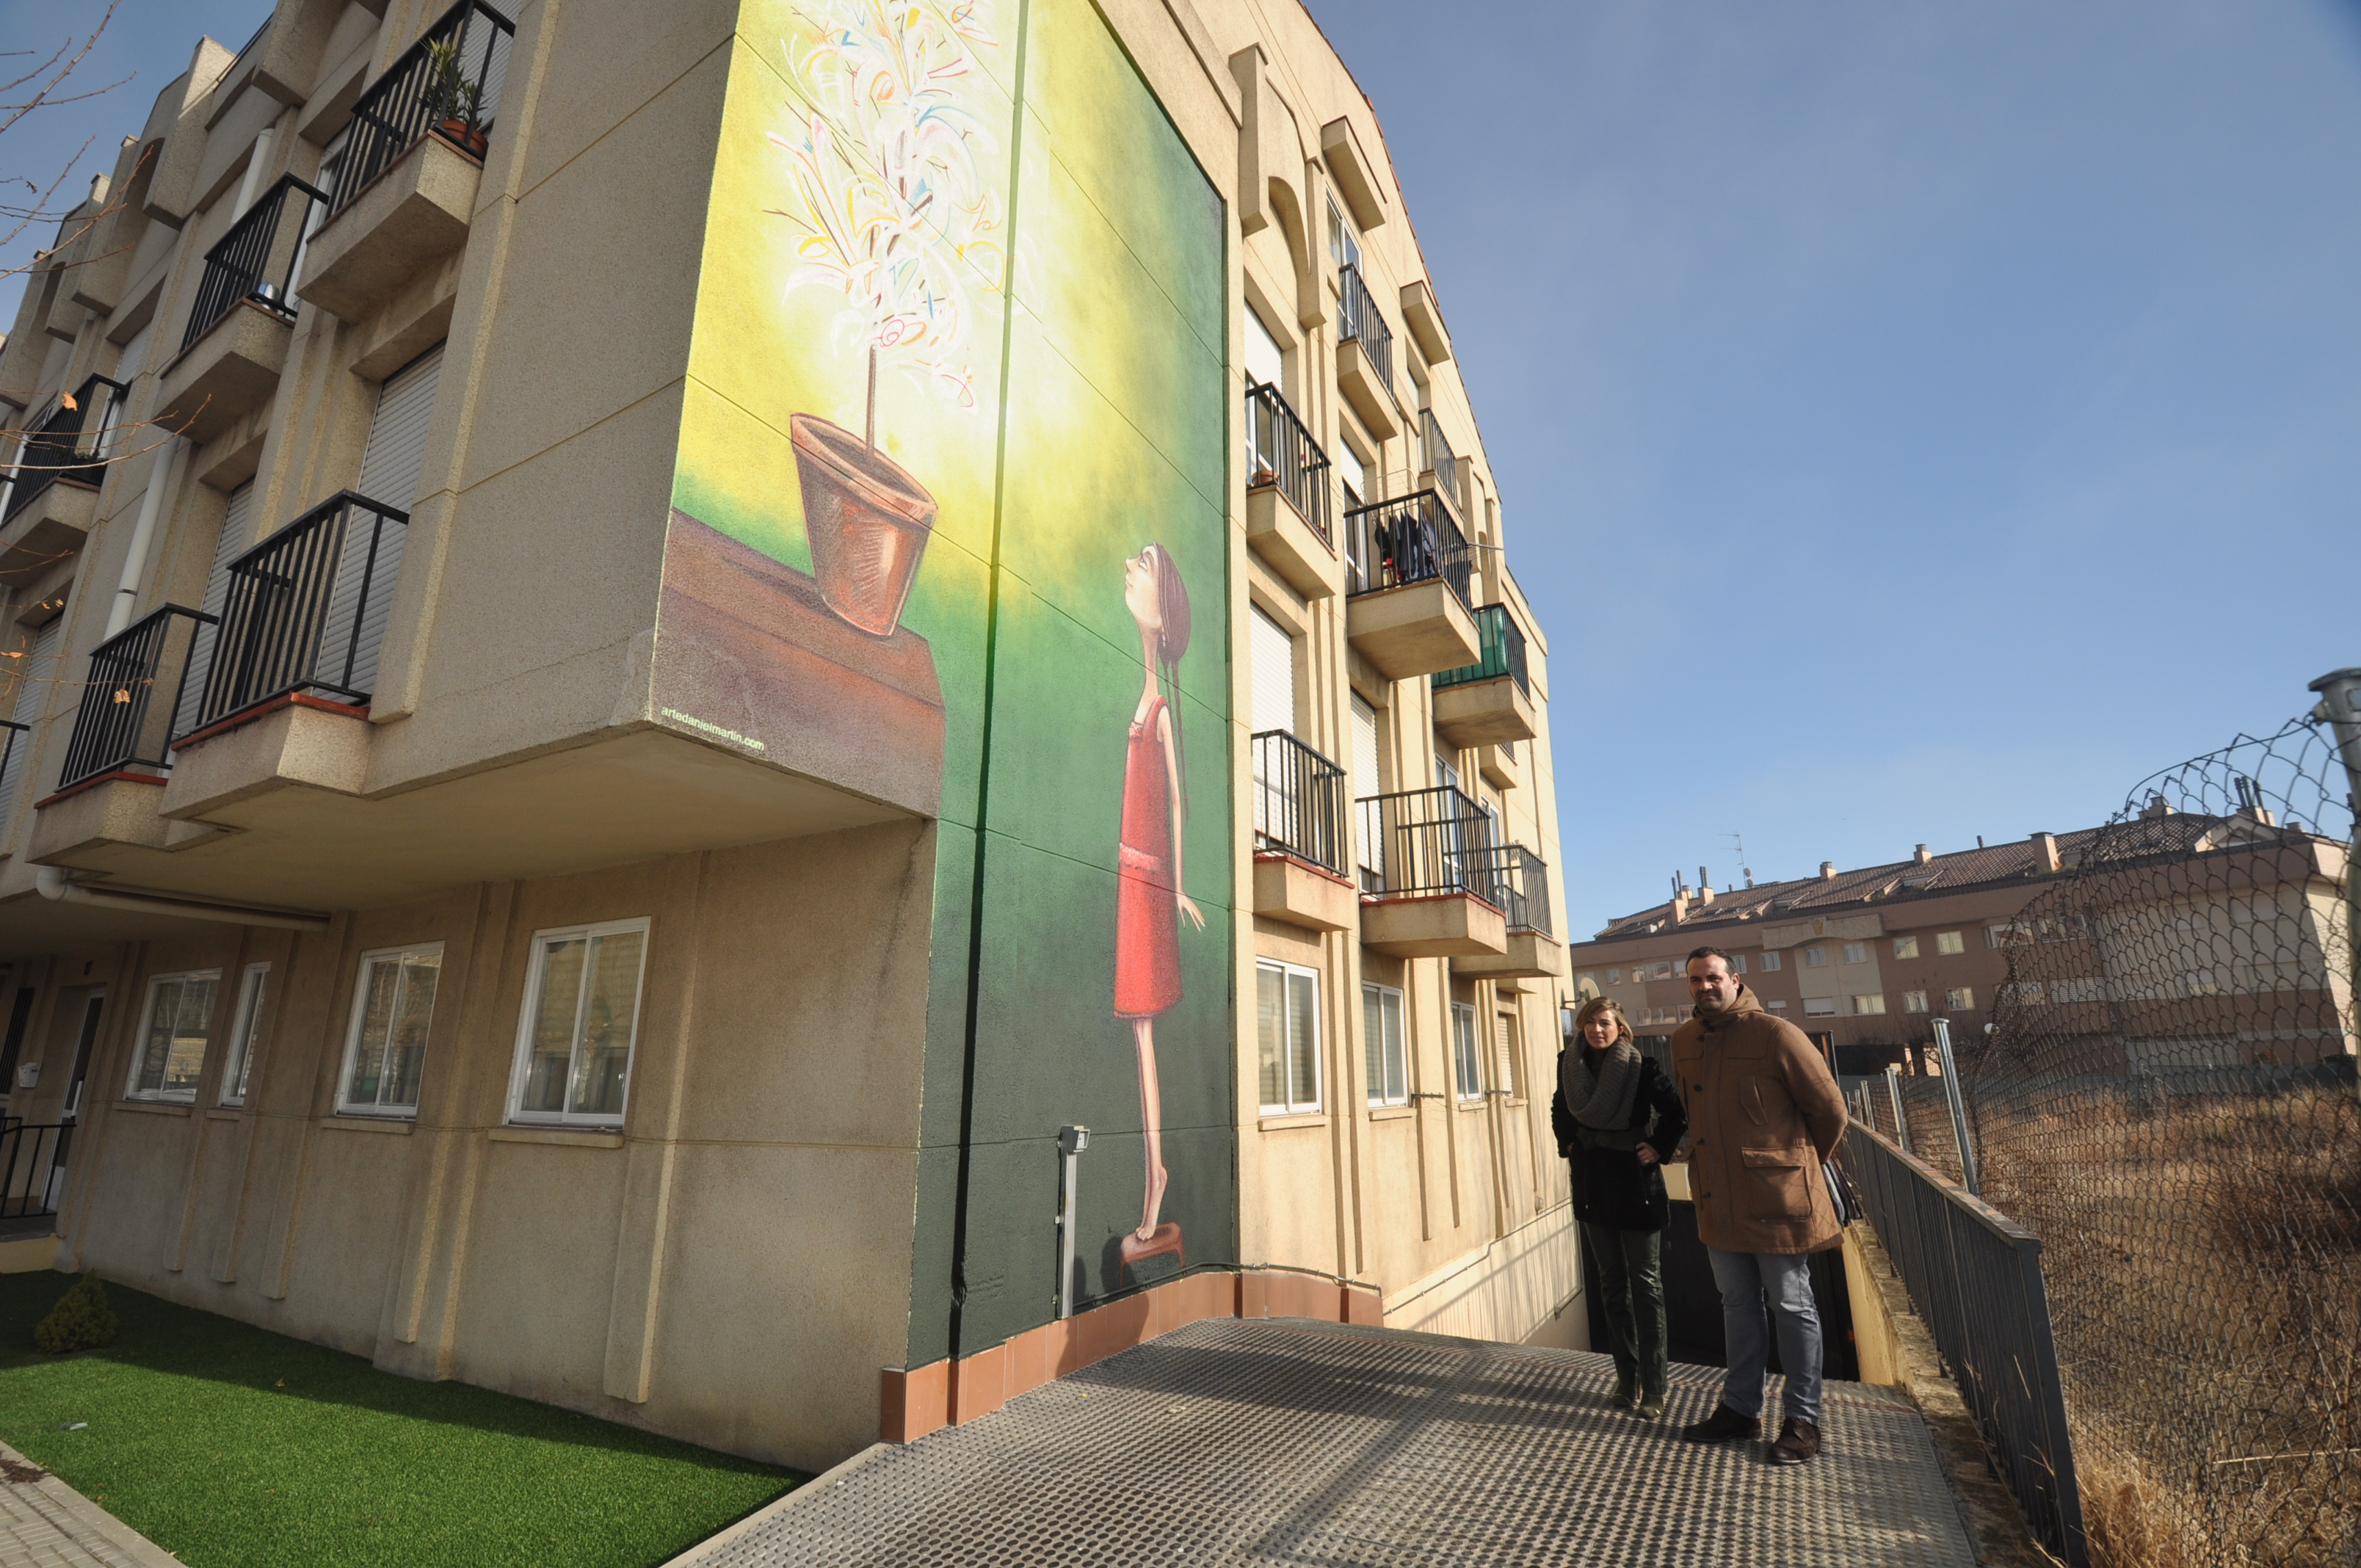 Un nuevo mural decora la avenida salamanca for El mural guadalajara avisos de ocasion